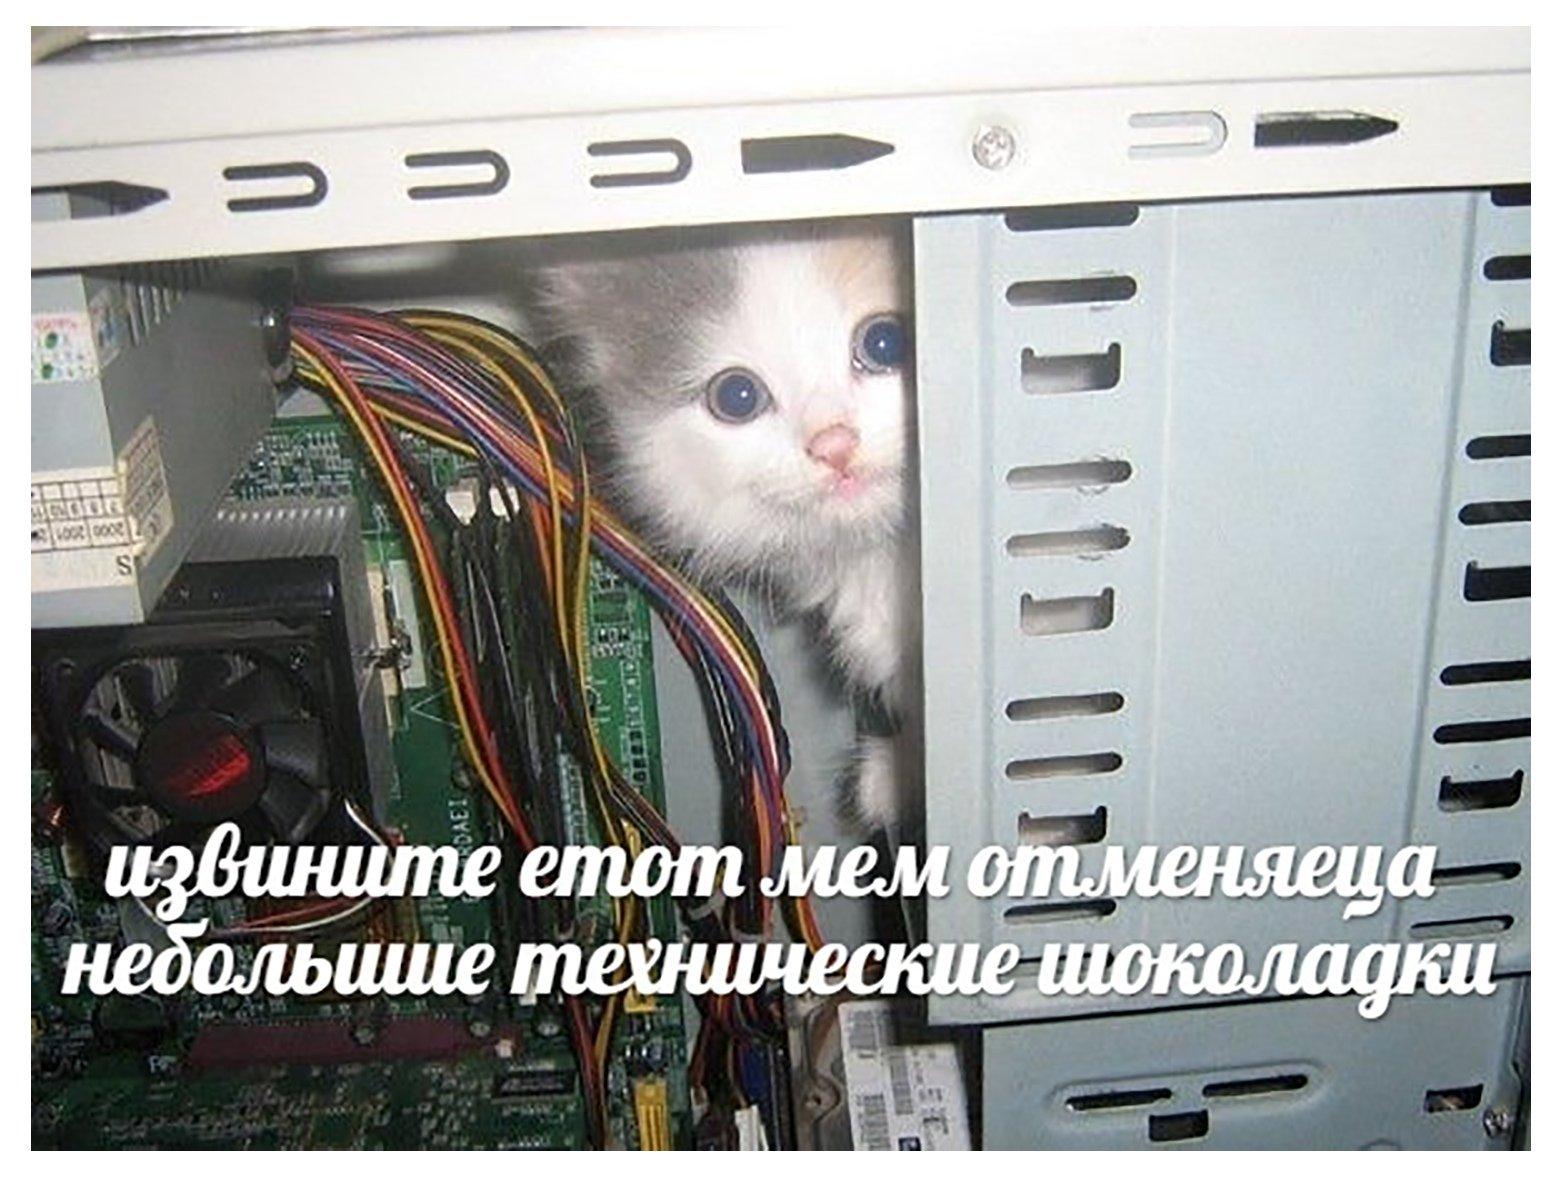 Приколы компьютерные картинки